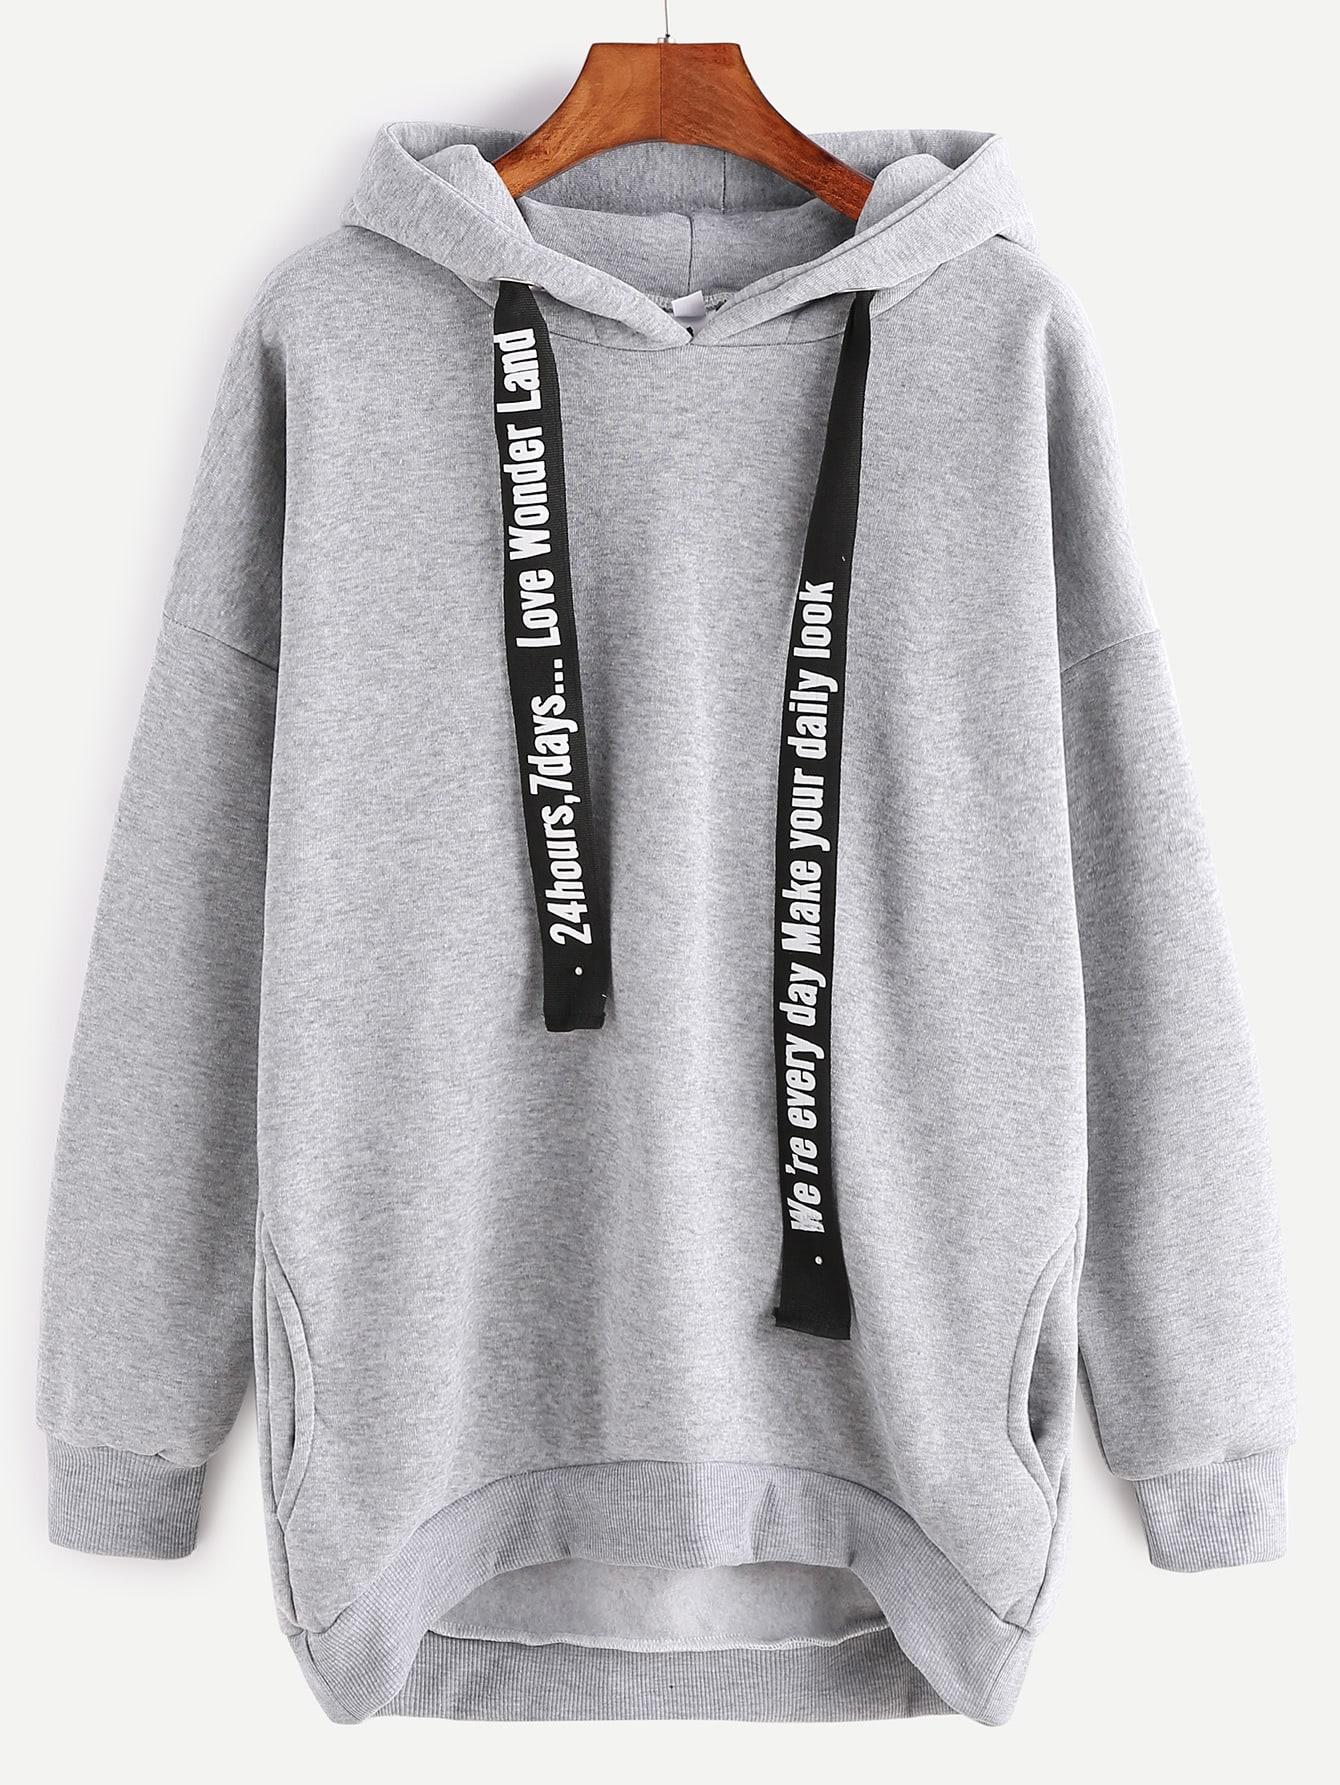 Grey Hooded Drop Shoulder Dip Hem Pockets Sweatshirt sweatshirt161128101